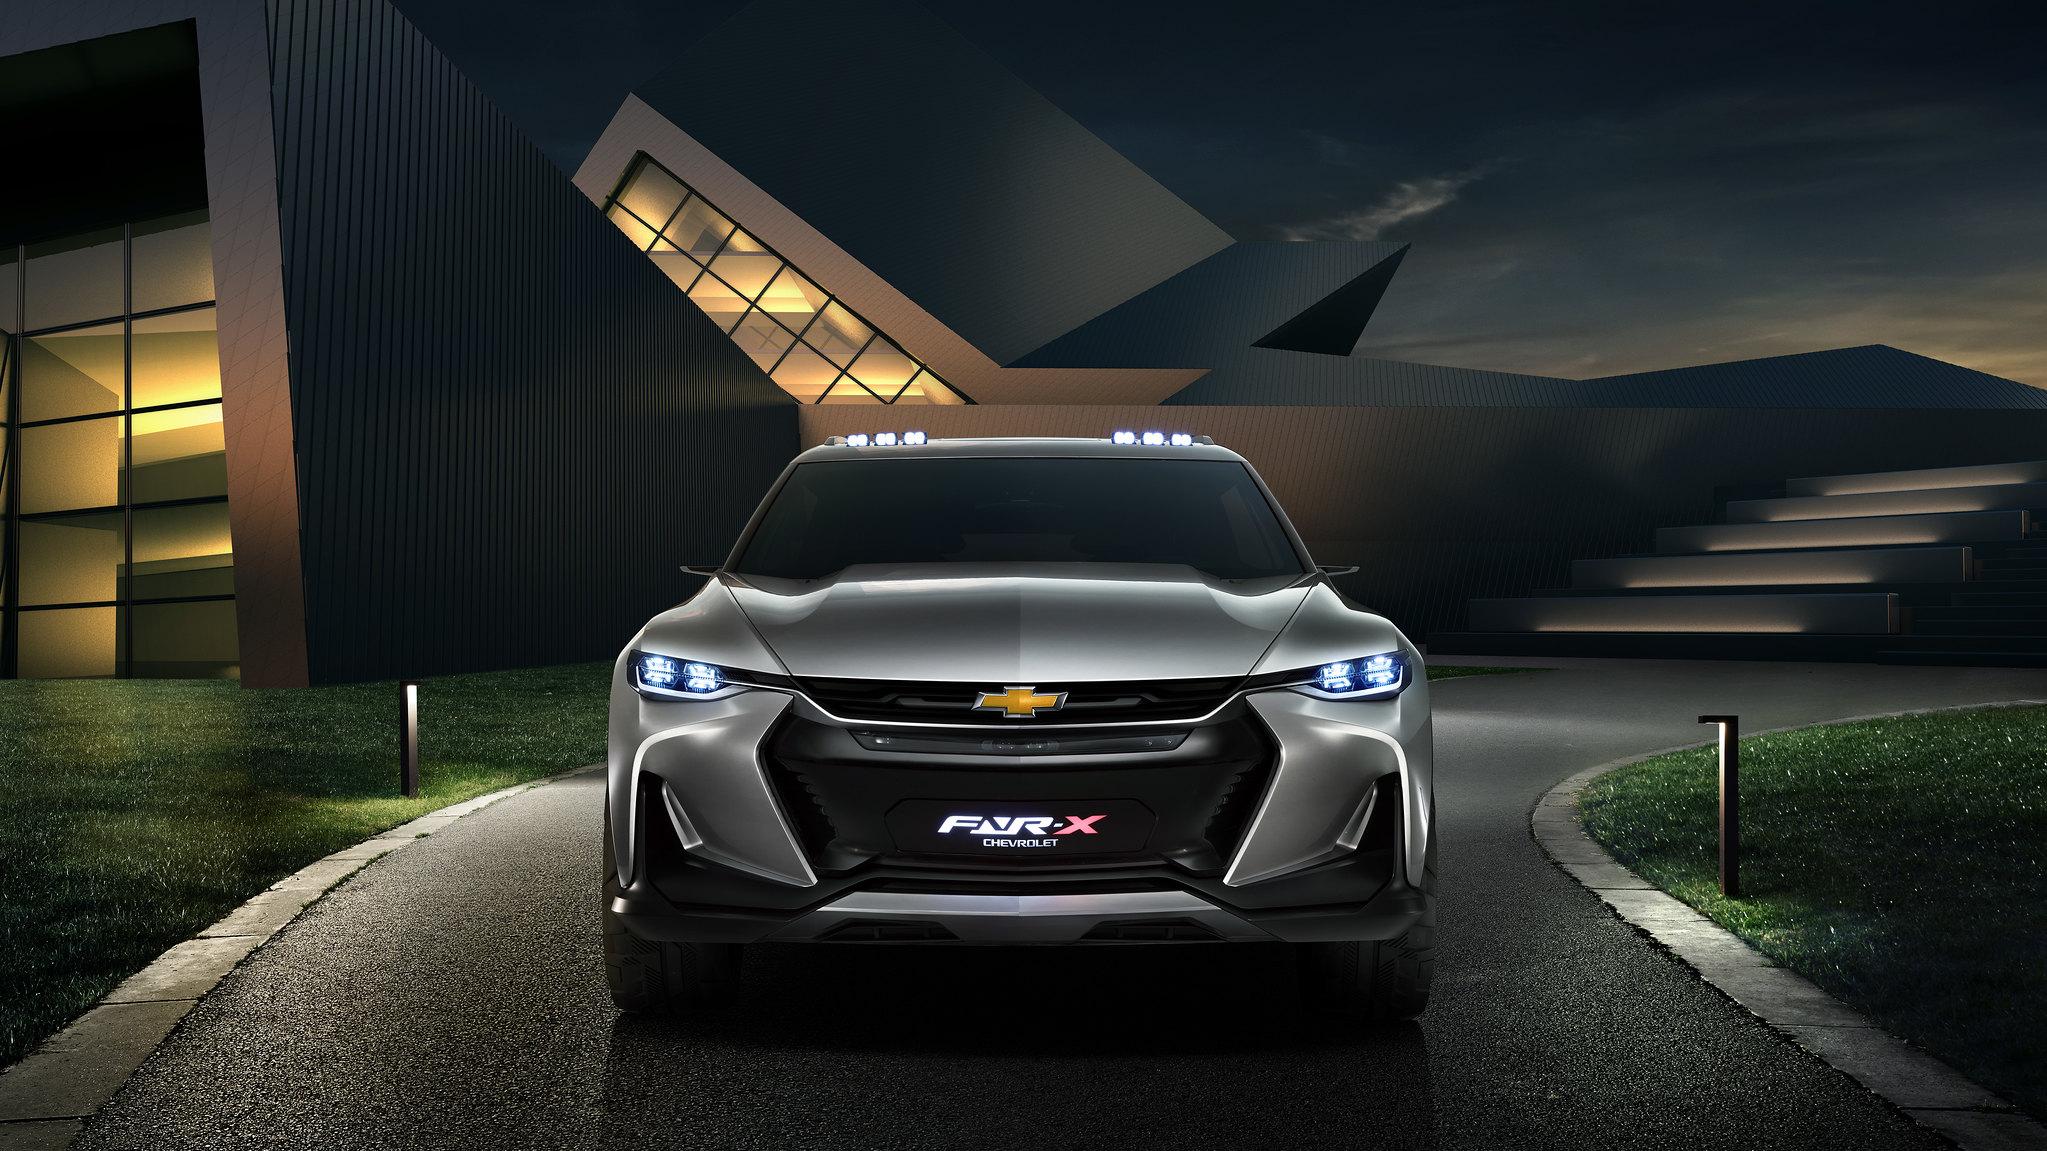 Chevrolet FNR-X concept makes global debut at Auto Shanghai 2017